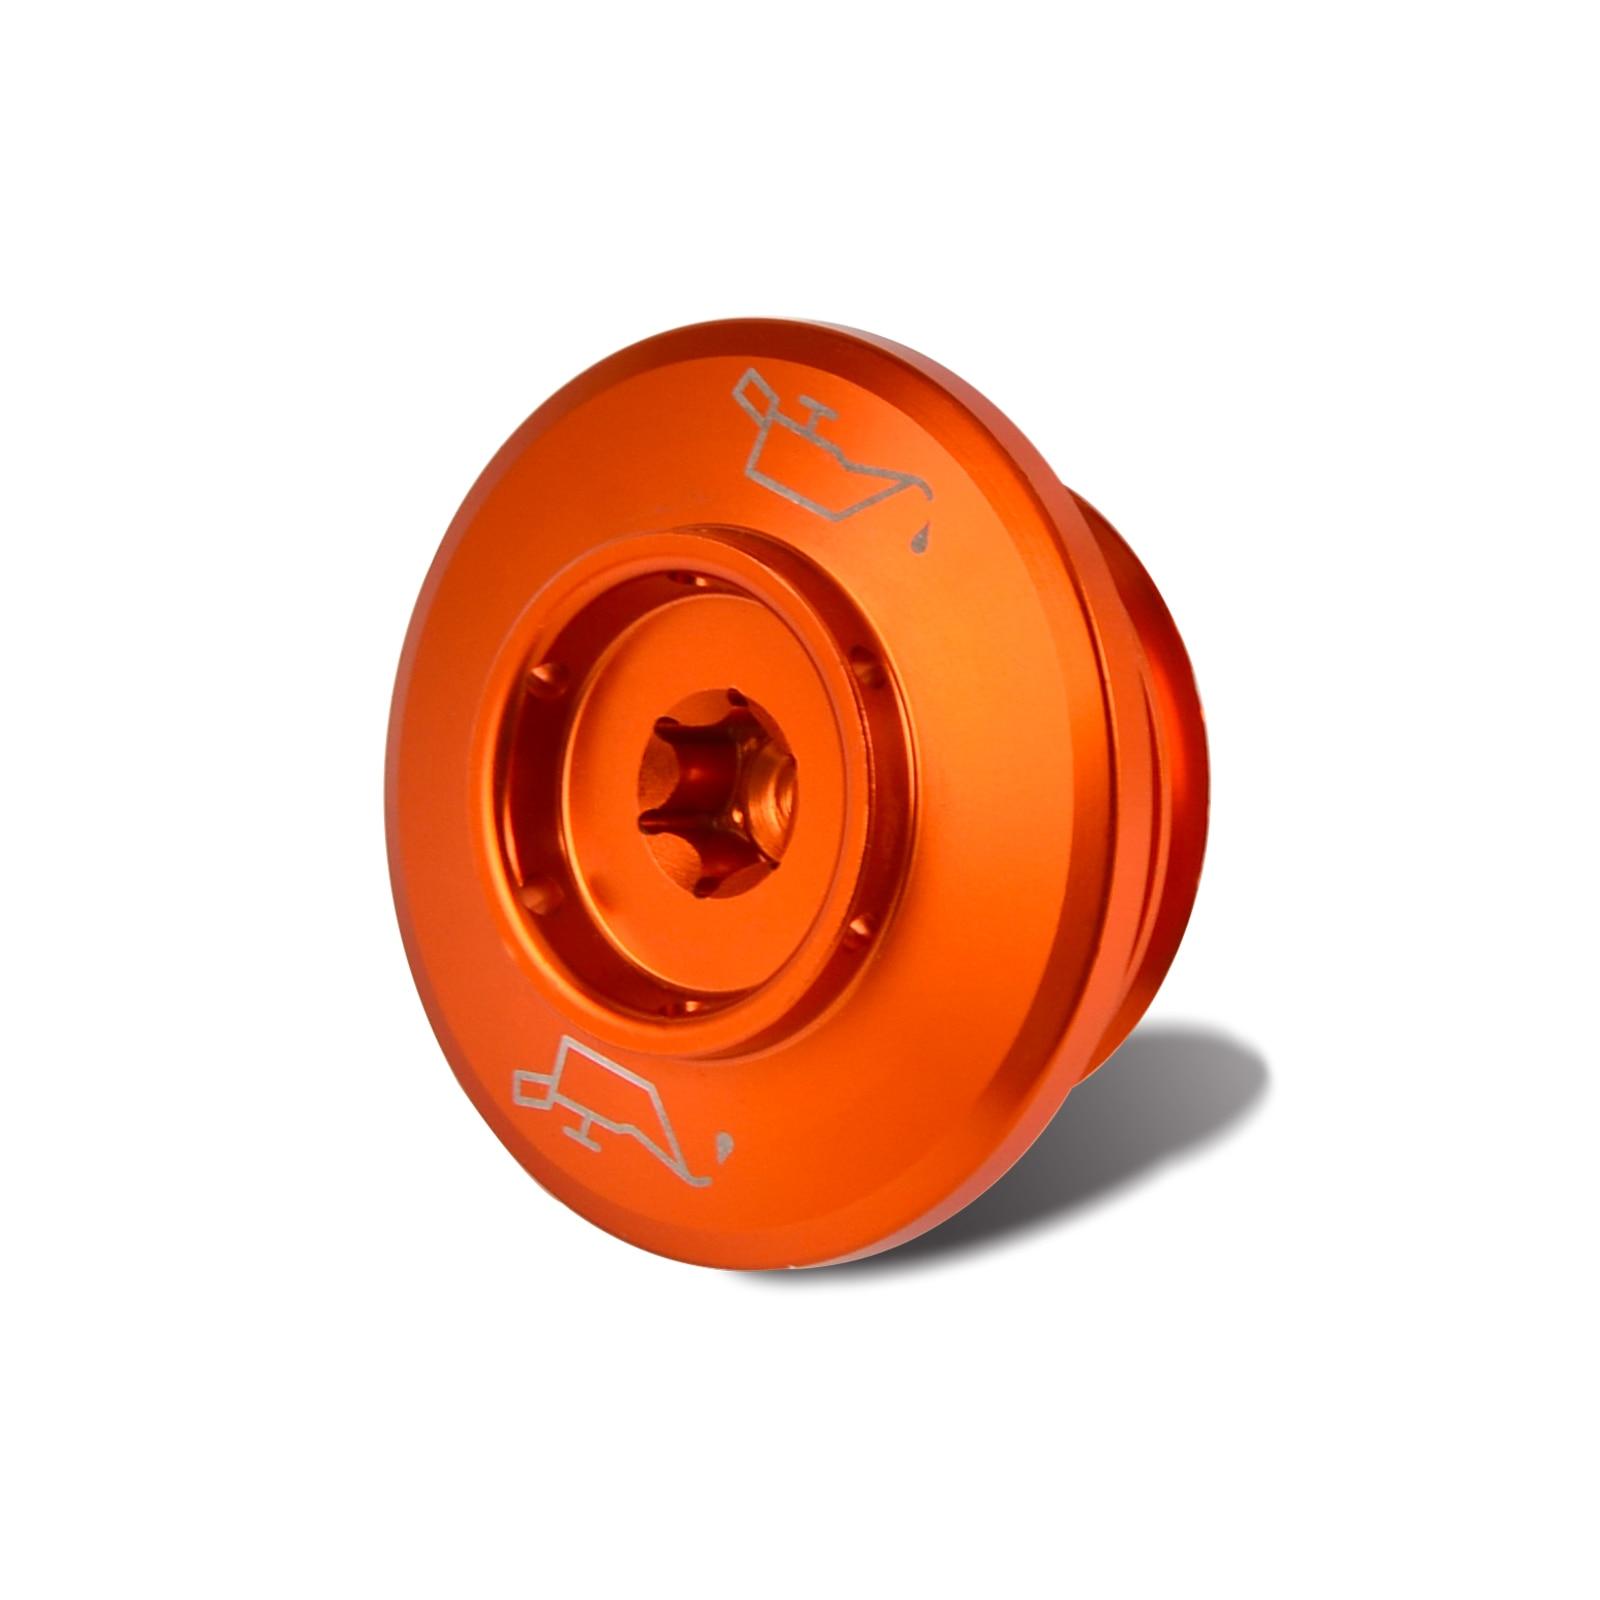 Oil Filler Plug Cover Cap For KTM 1090 1190 1290 Adventure 2013-2017 2018 2019